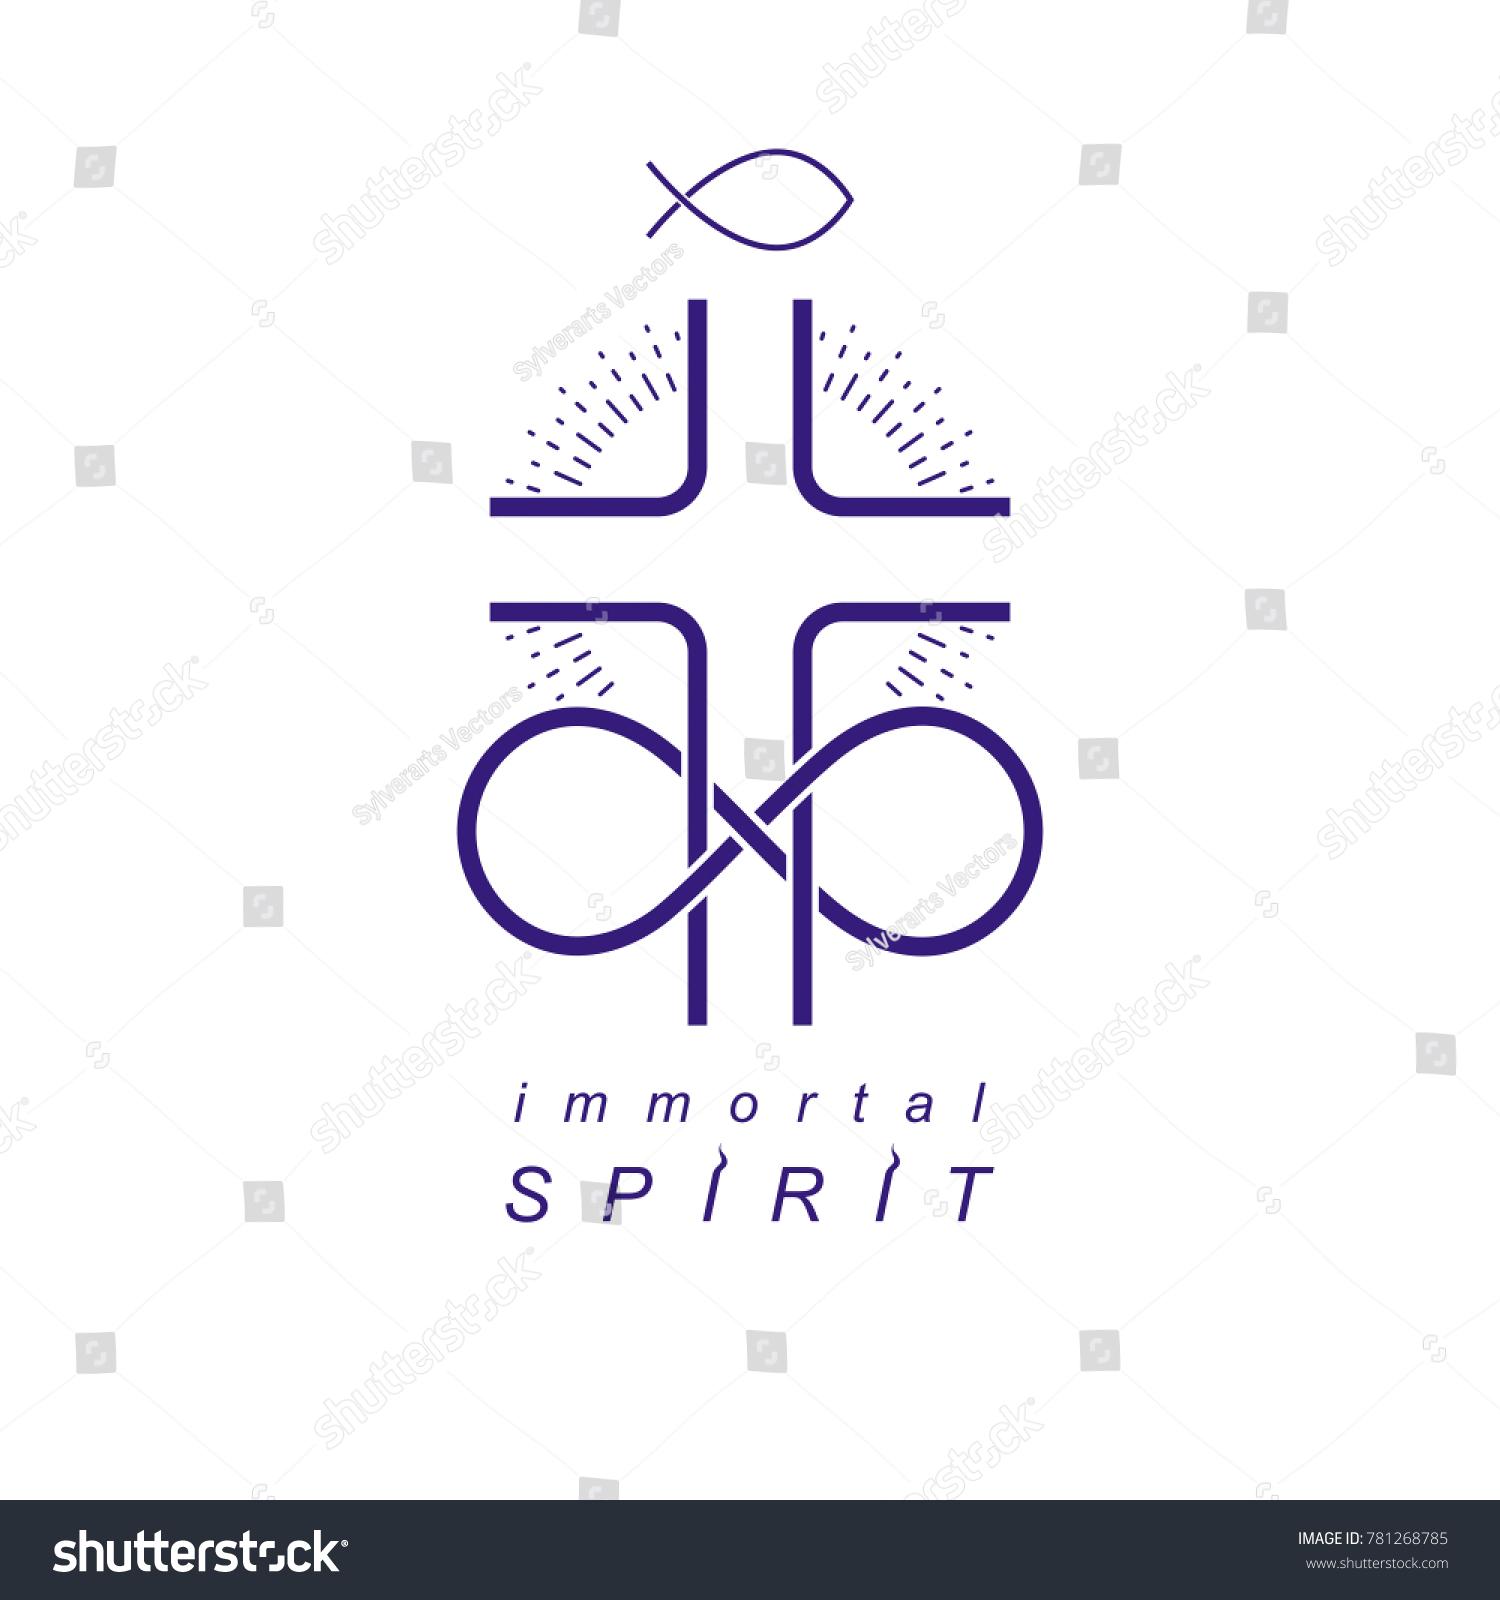 Immortal god conceptual symbol combined infinity stock immortal god conceptual symbol combined with infinity loop sign and christian cross creative logo biocorpaavc